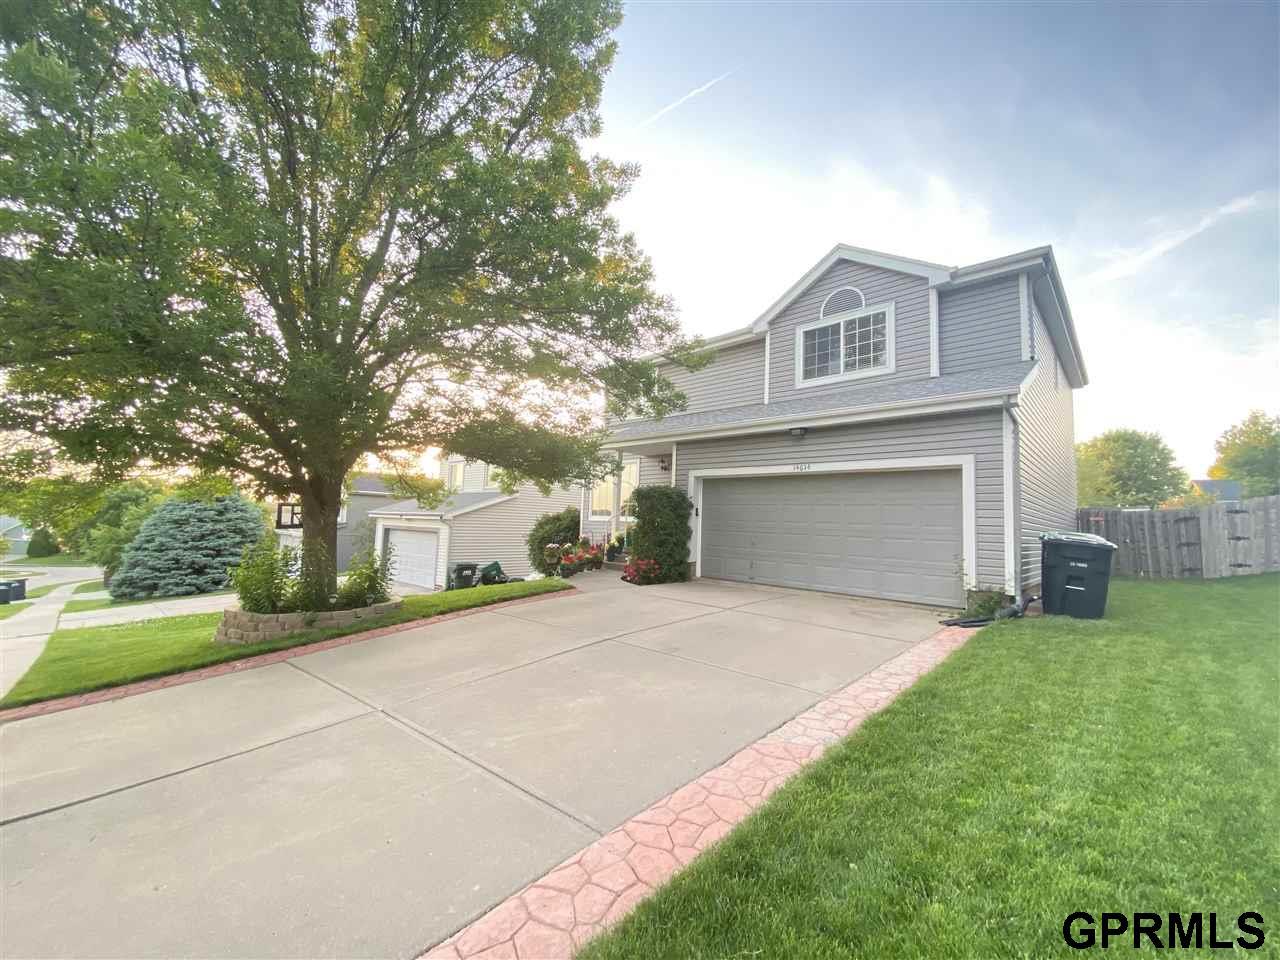 14614 Grand Avenue, Omaha, NE 68116